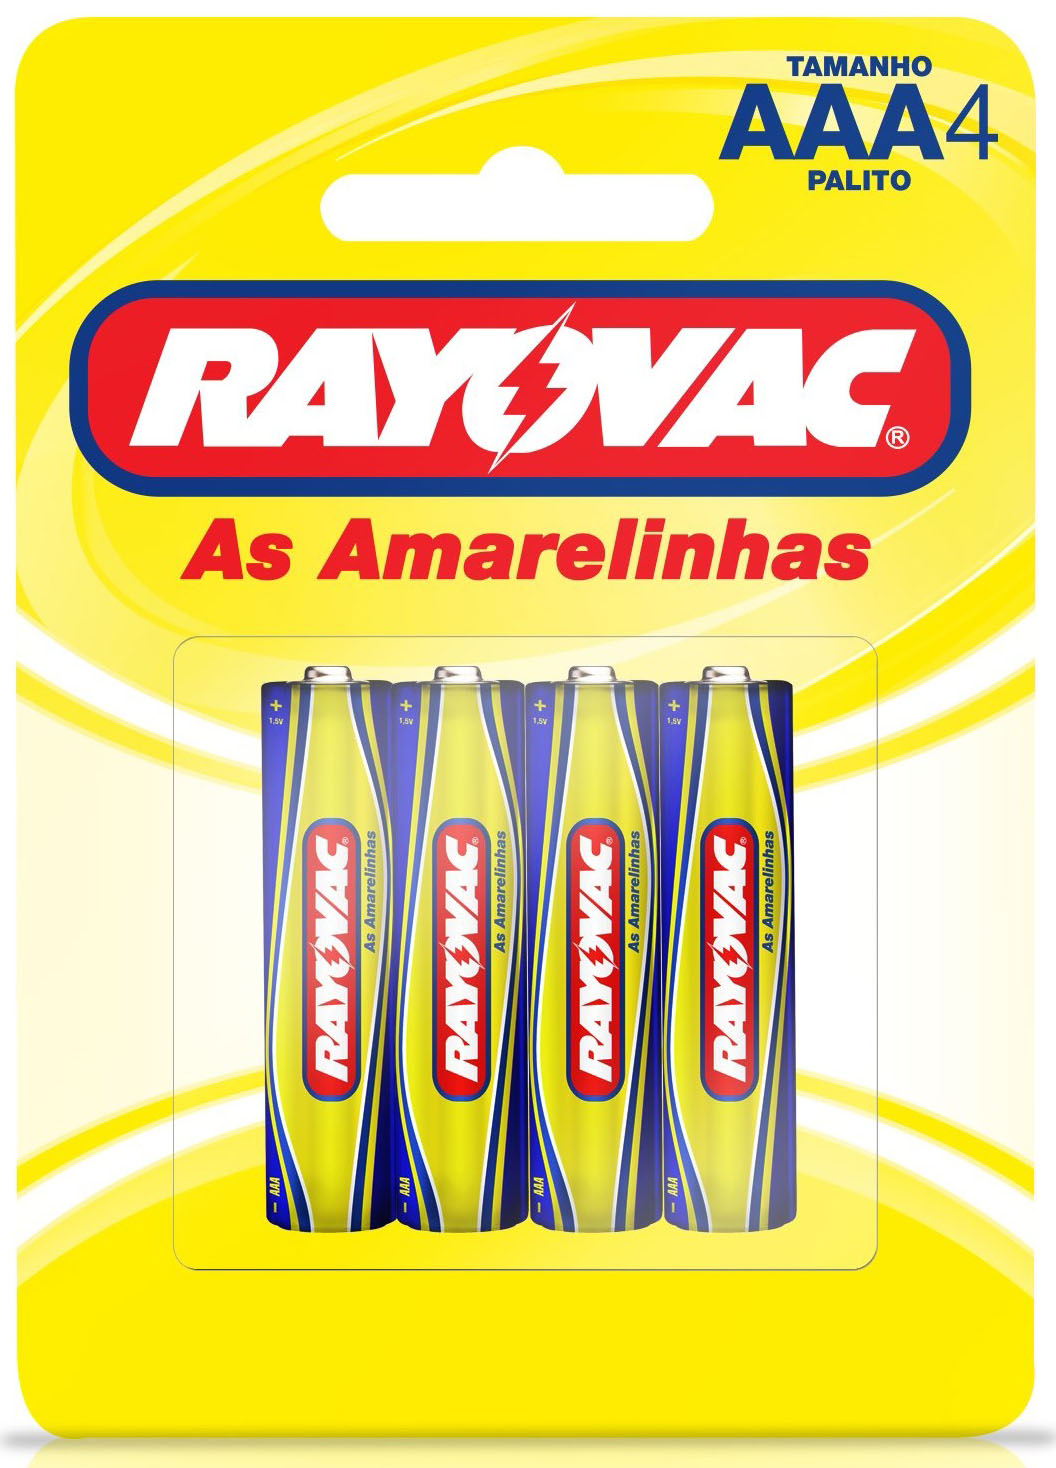 PILHA AMARELINHA PALITO AAA C/4UN 10307